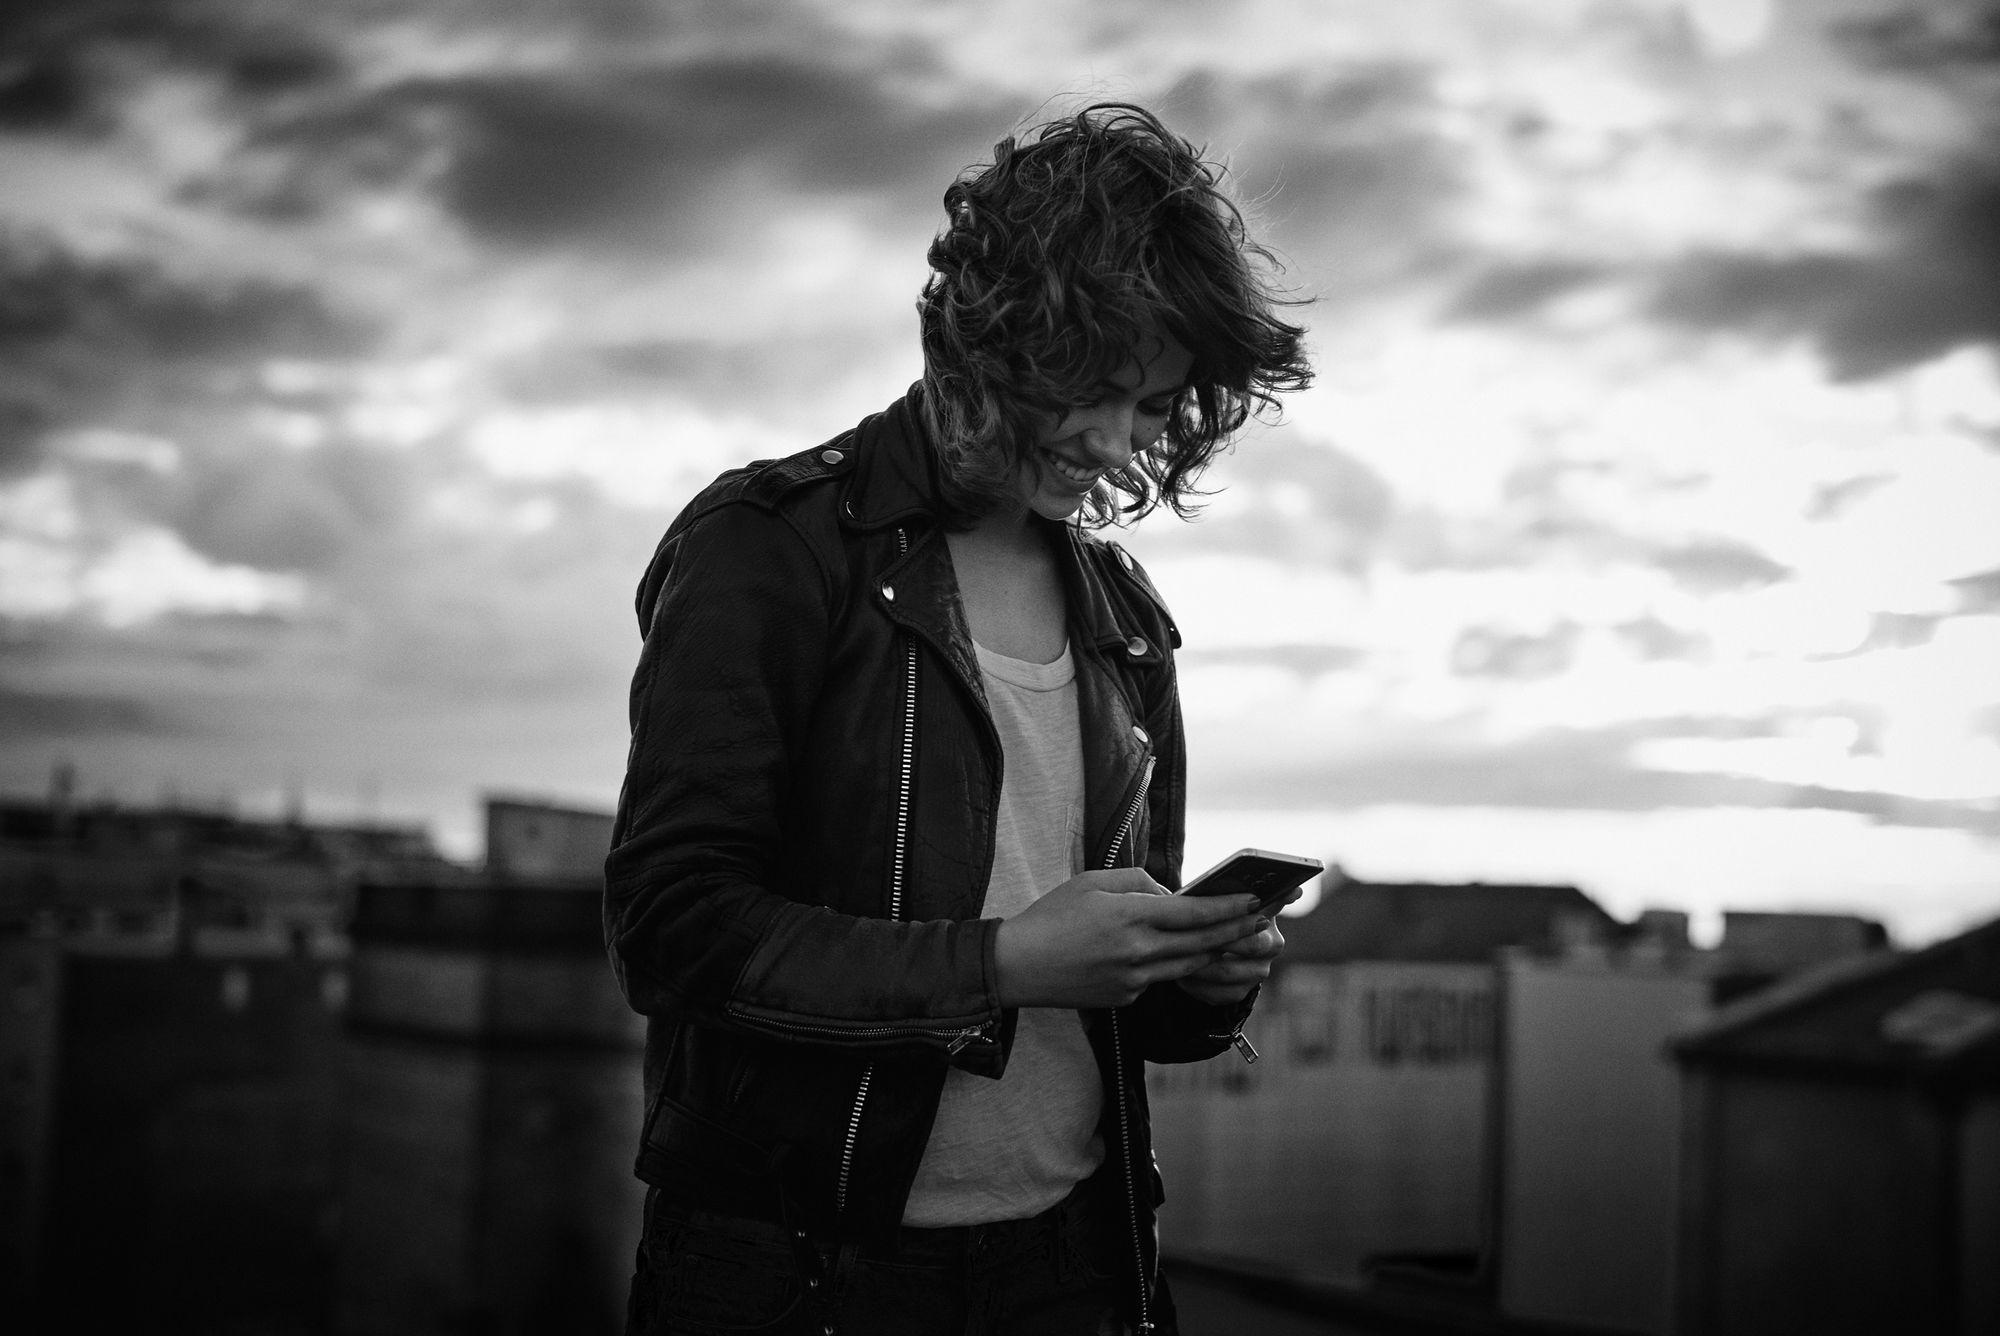 EMEIS DEUBEL: Lars Borges for Vodafone